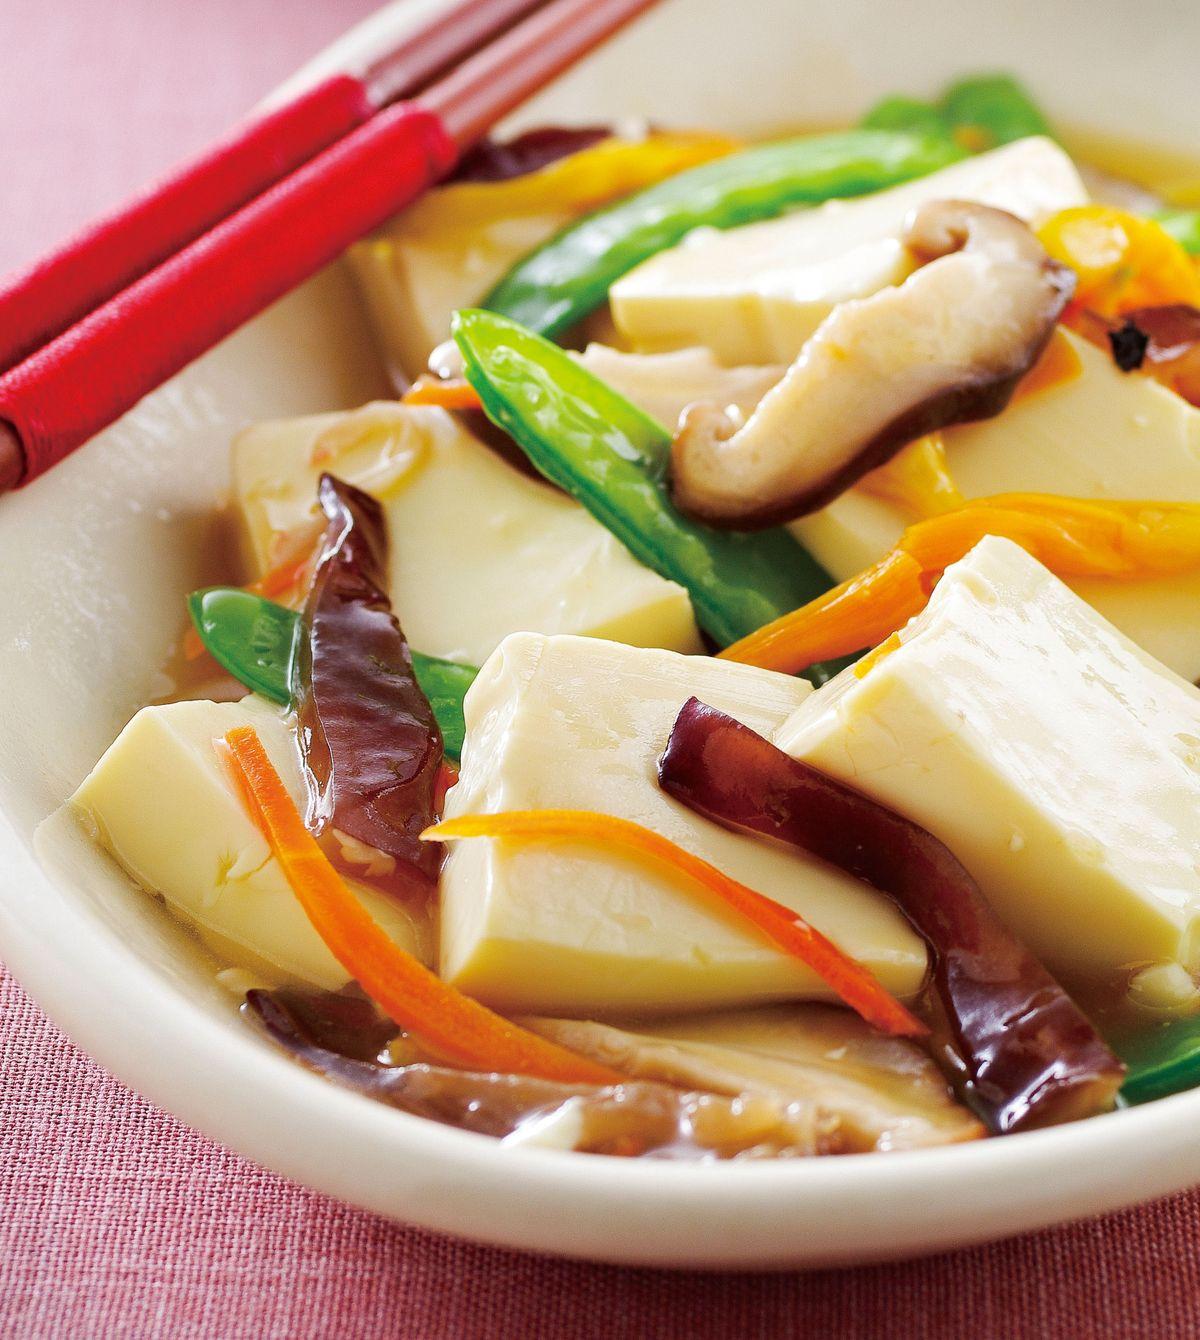 食譜:羅漢豆腐